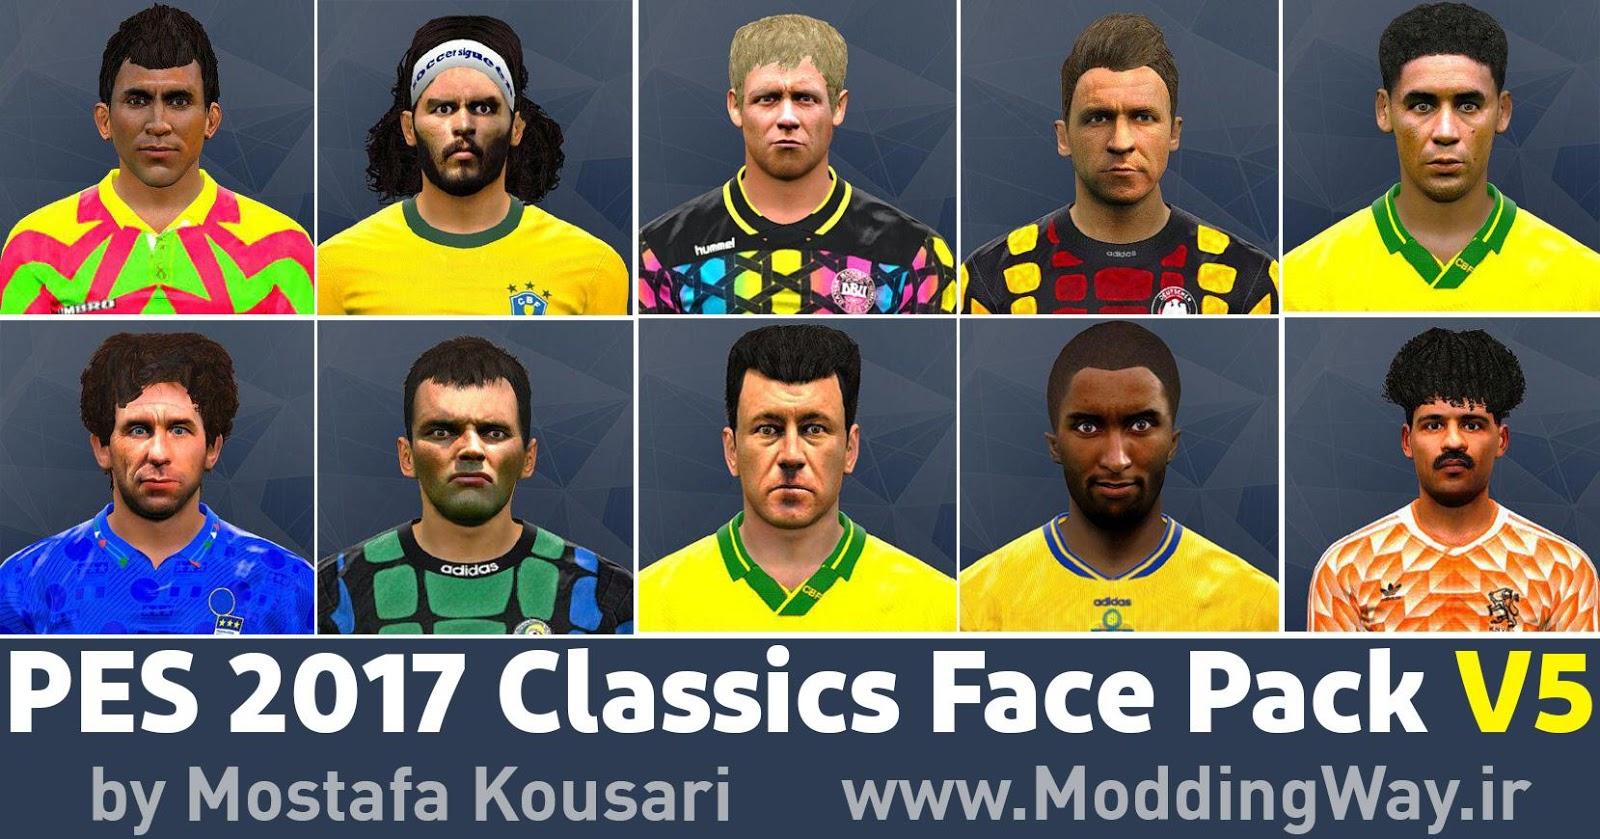 PES 2017 Classics FacePack V5 by Mostafa Kousari